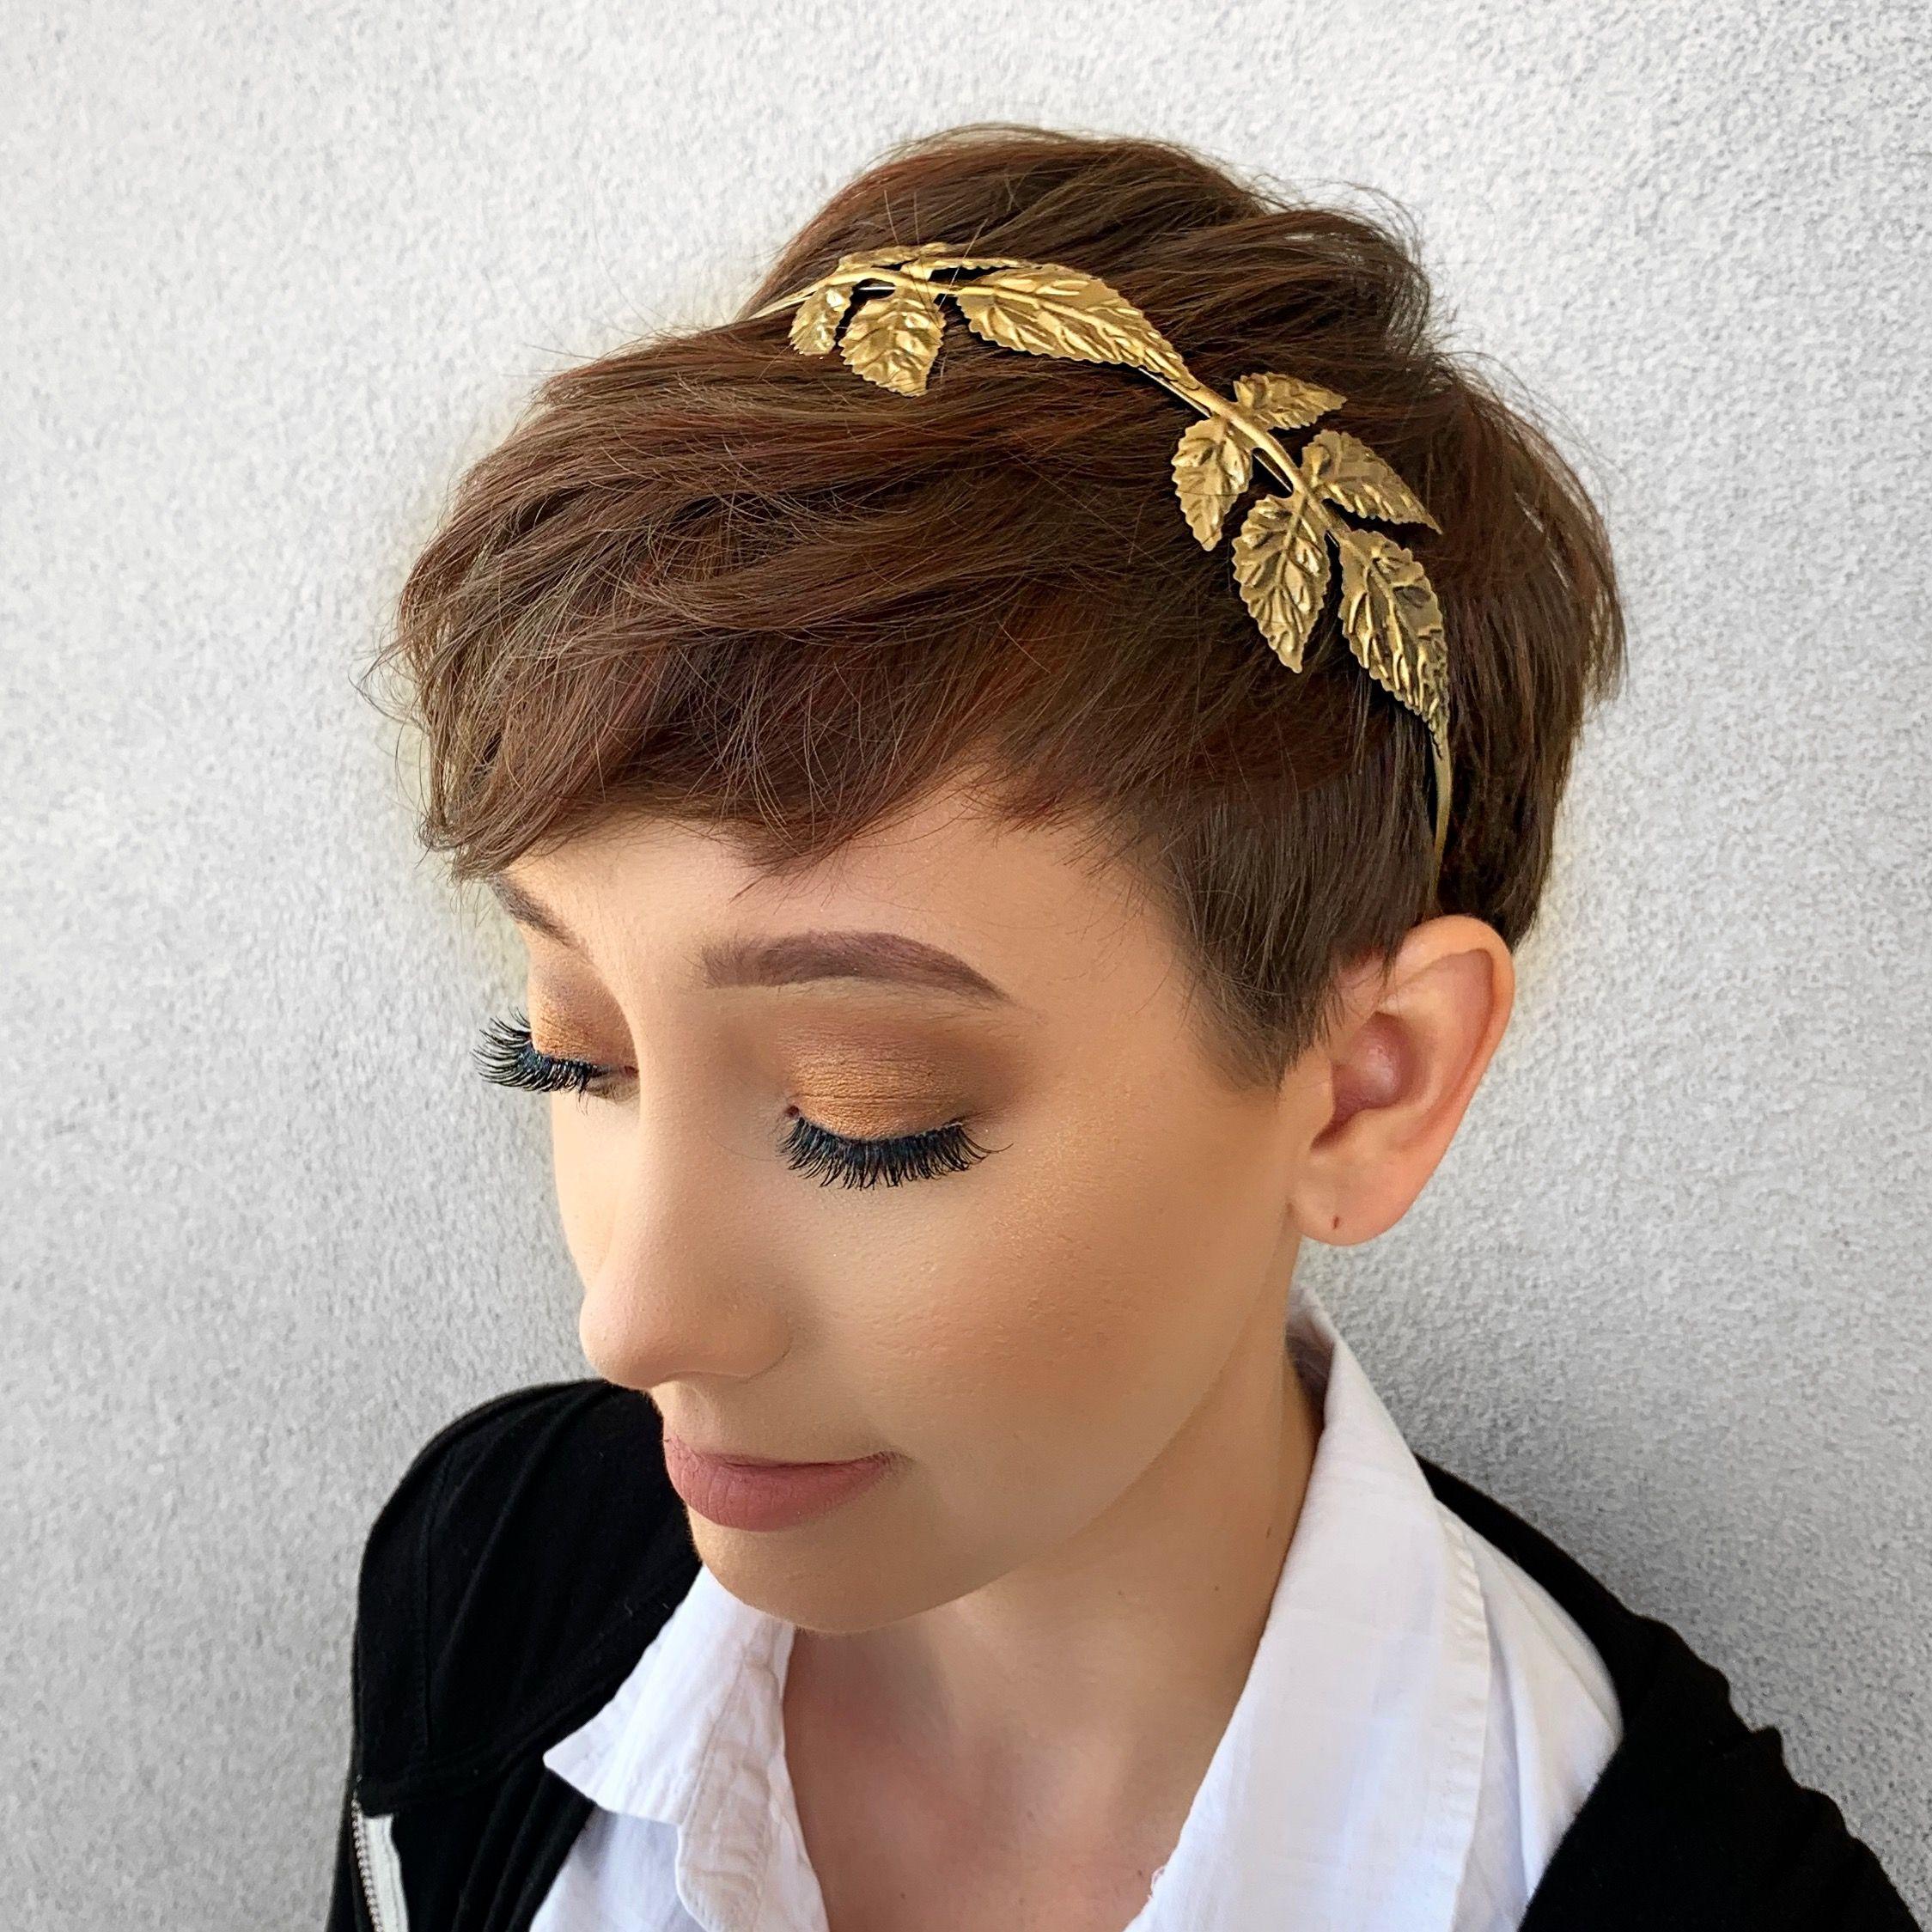 pixie bridesmaid hair colair beauty lounge & med spa gilbert